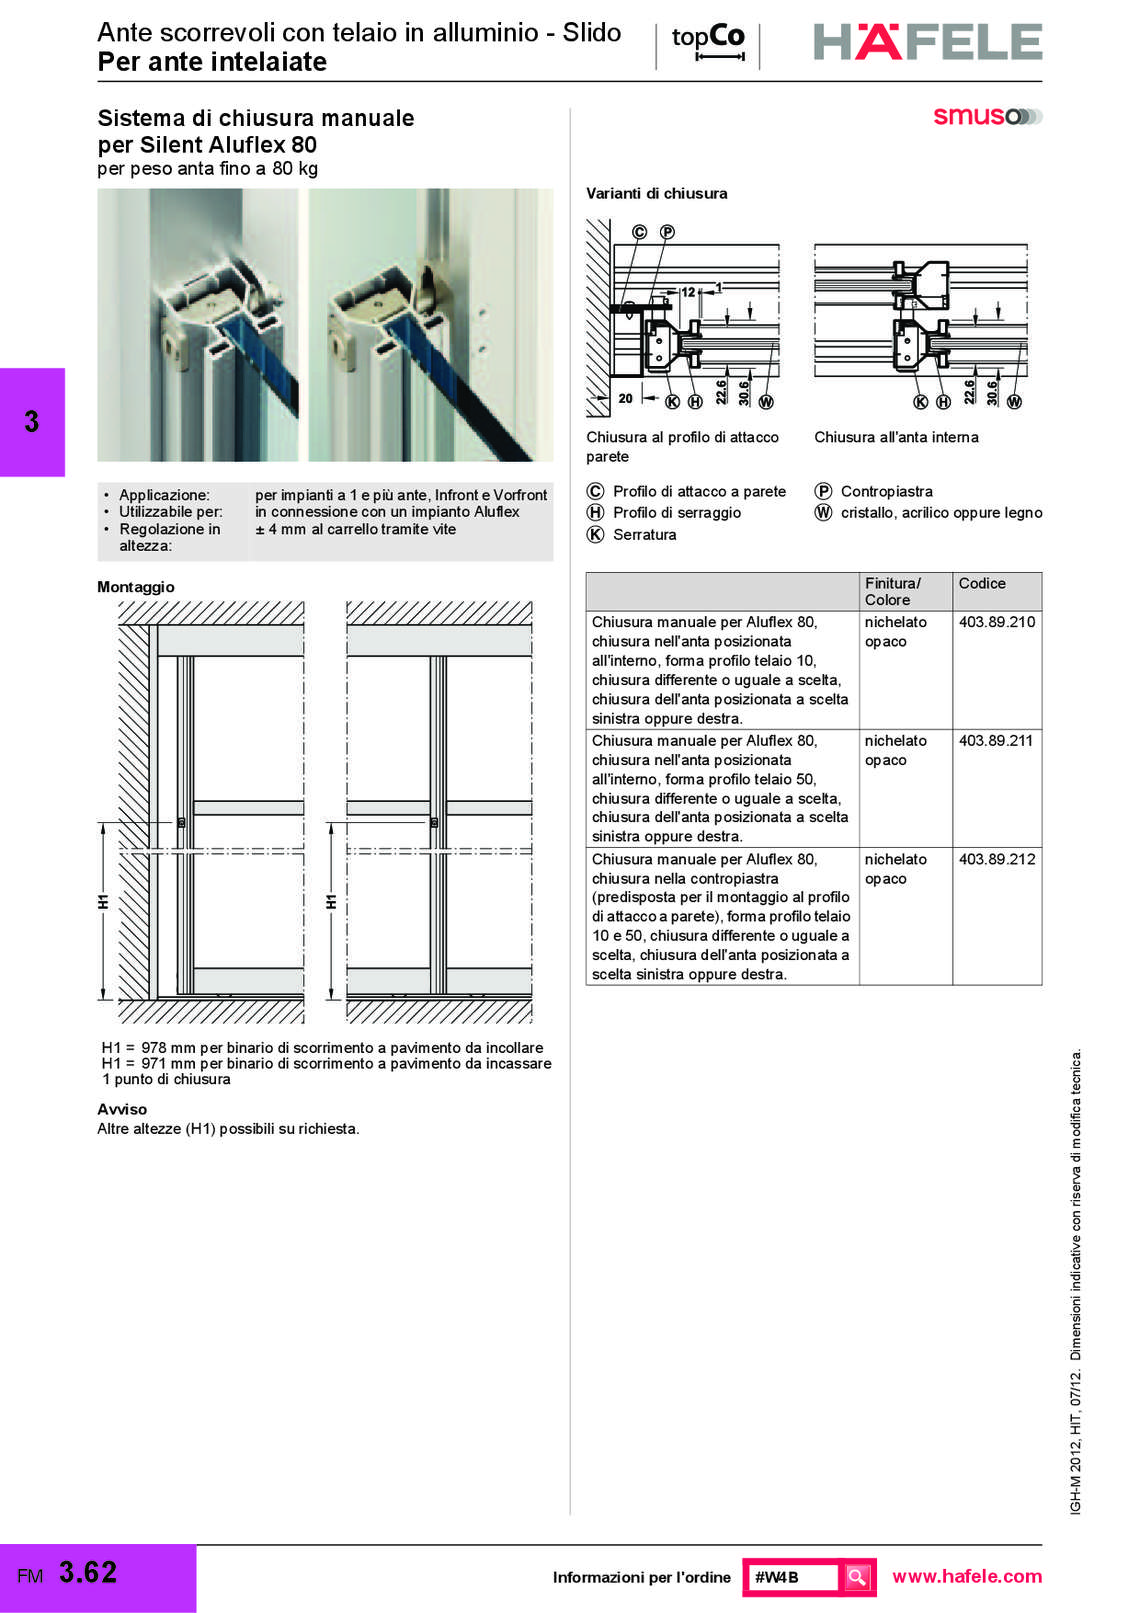 hafele-prodotti-su-misura_81_077.jpg